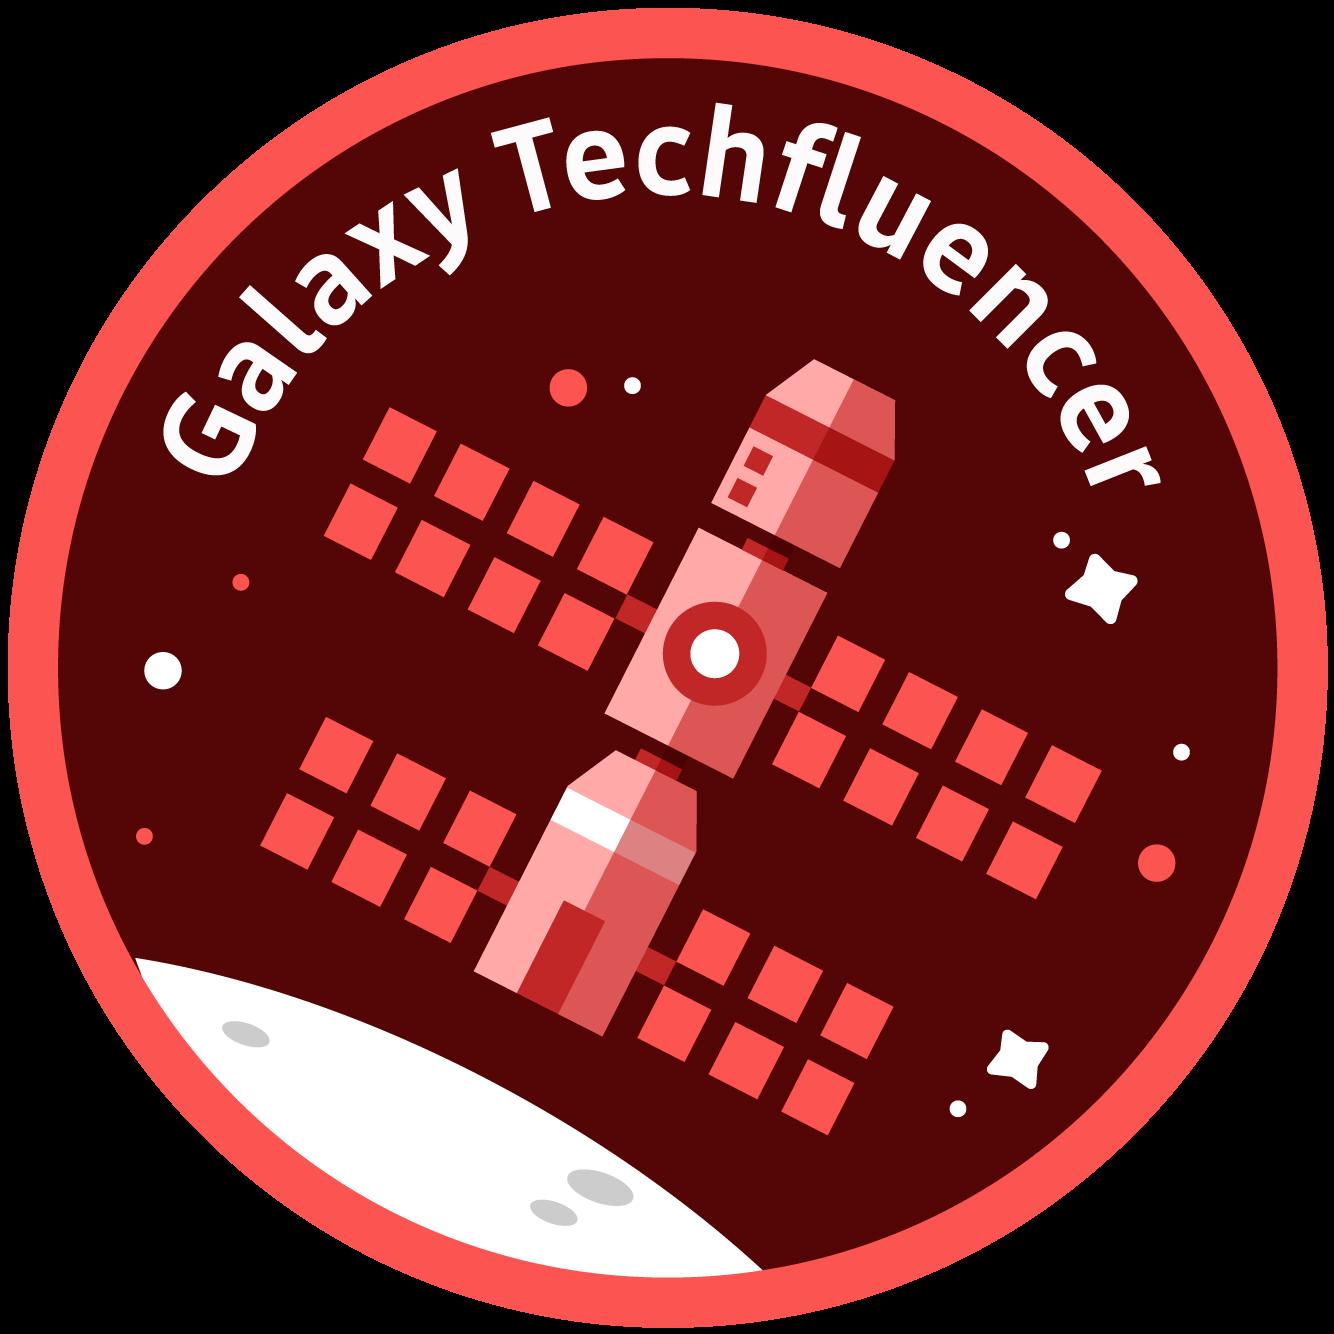 Galaxy Techfluencer